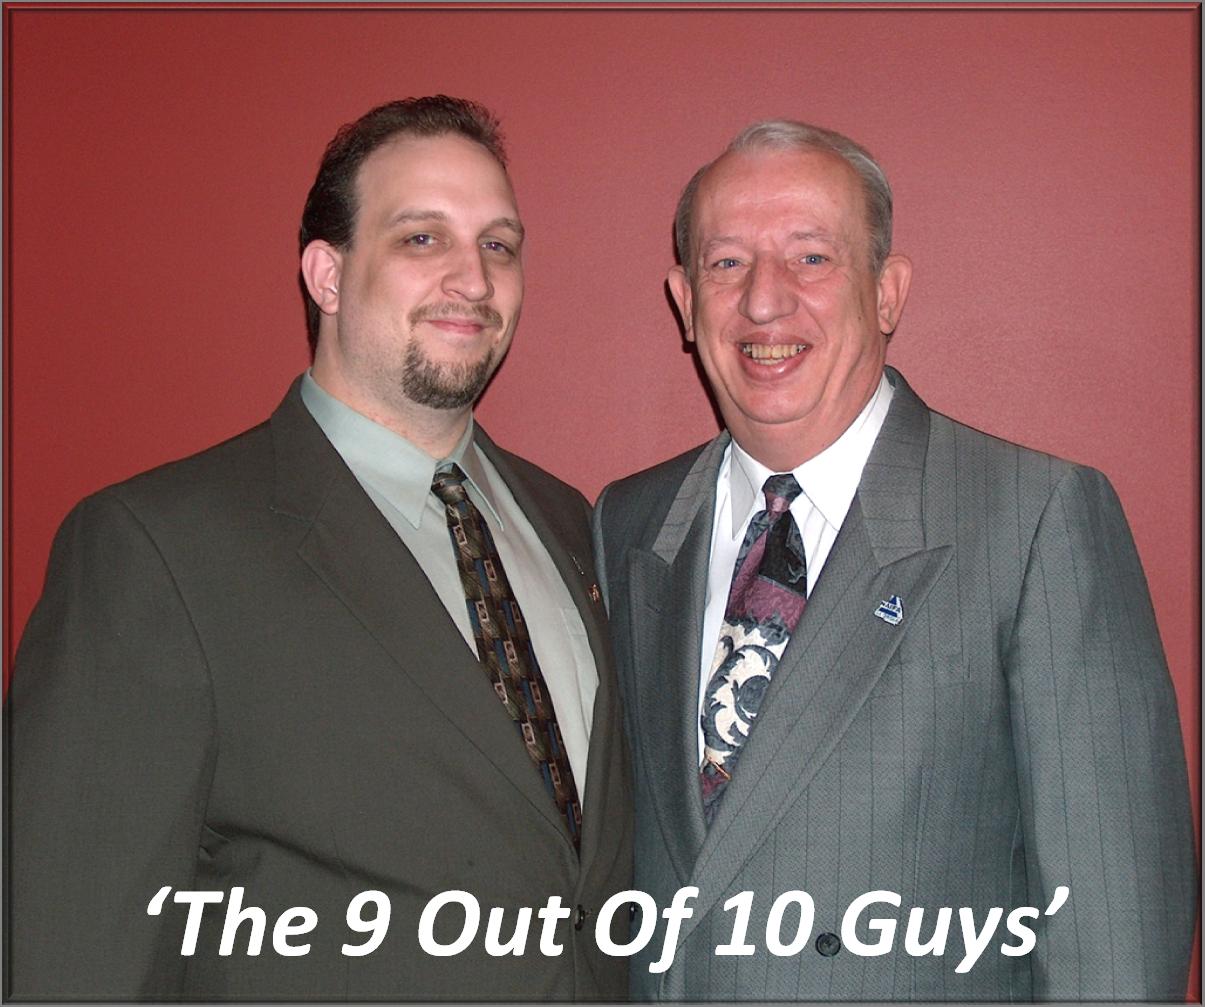 Jeremy Nason & Lew Nason... Trainers, Coaches, Mentors